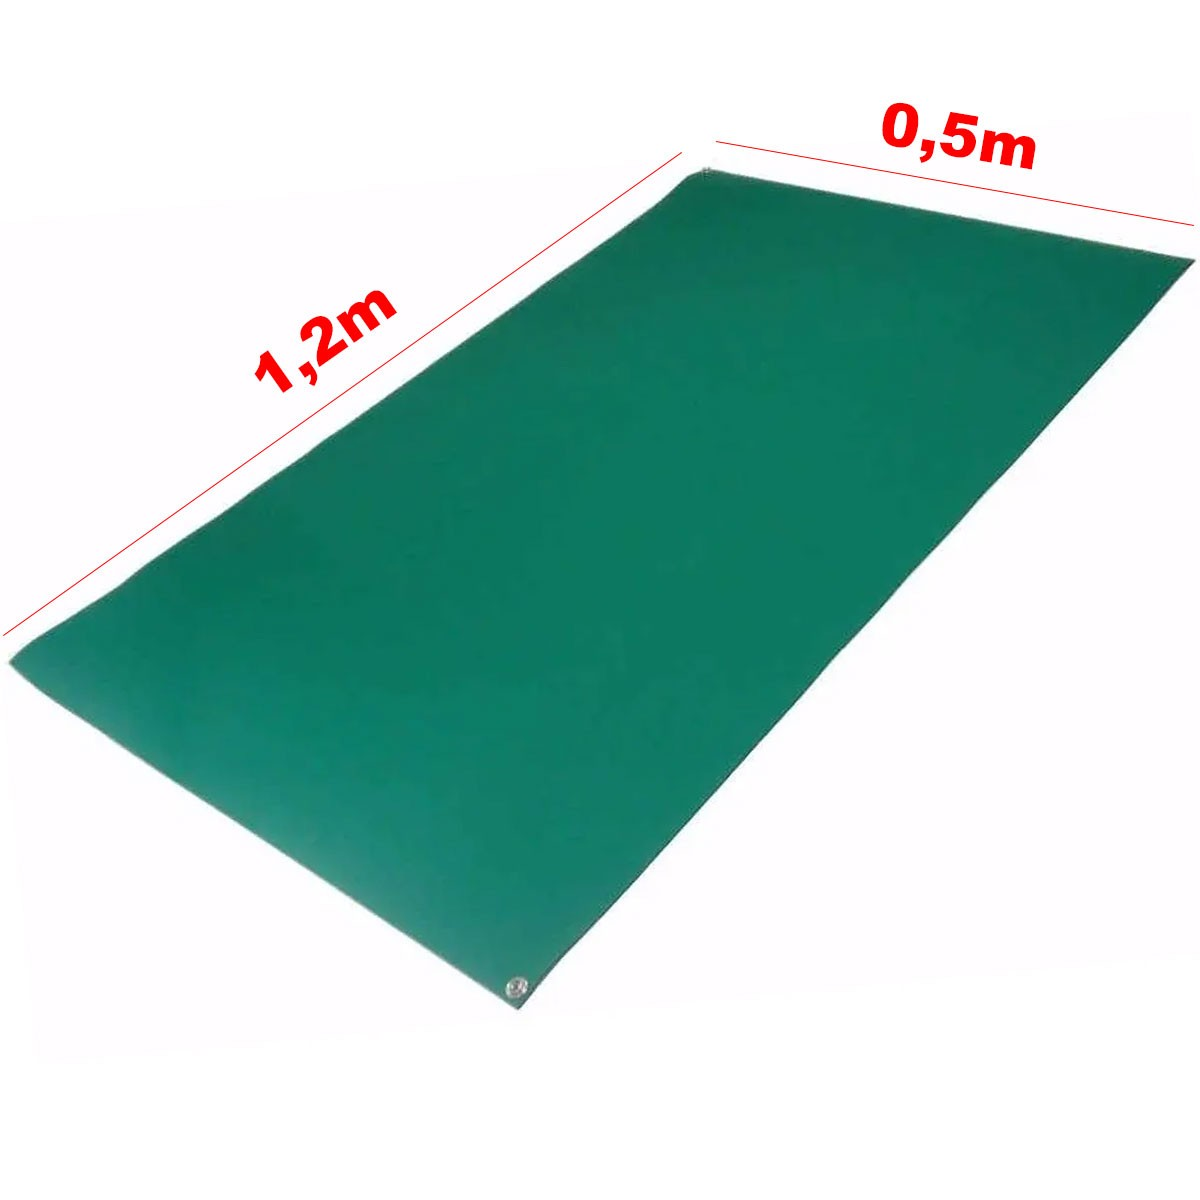 Manta Antiestática de Bancada - Hikari 1,20x0,50m Cor Verde